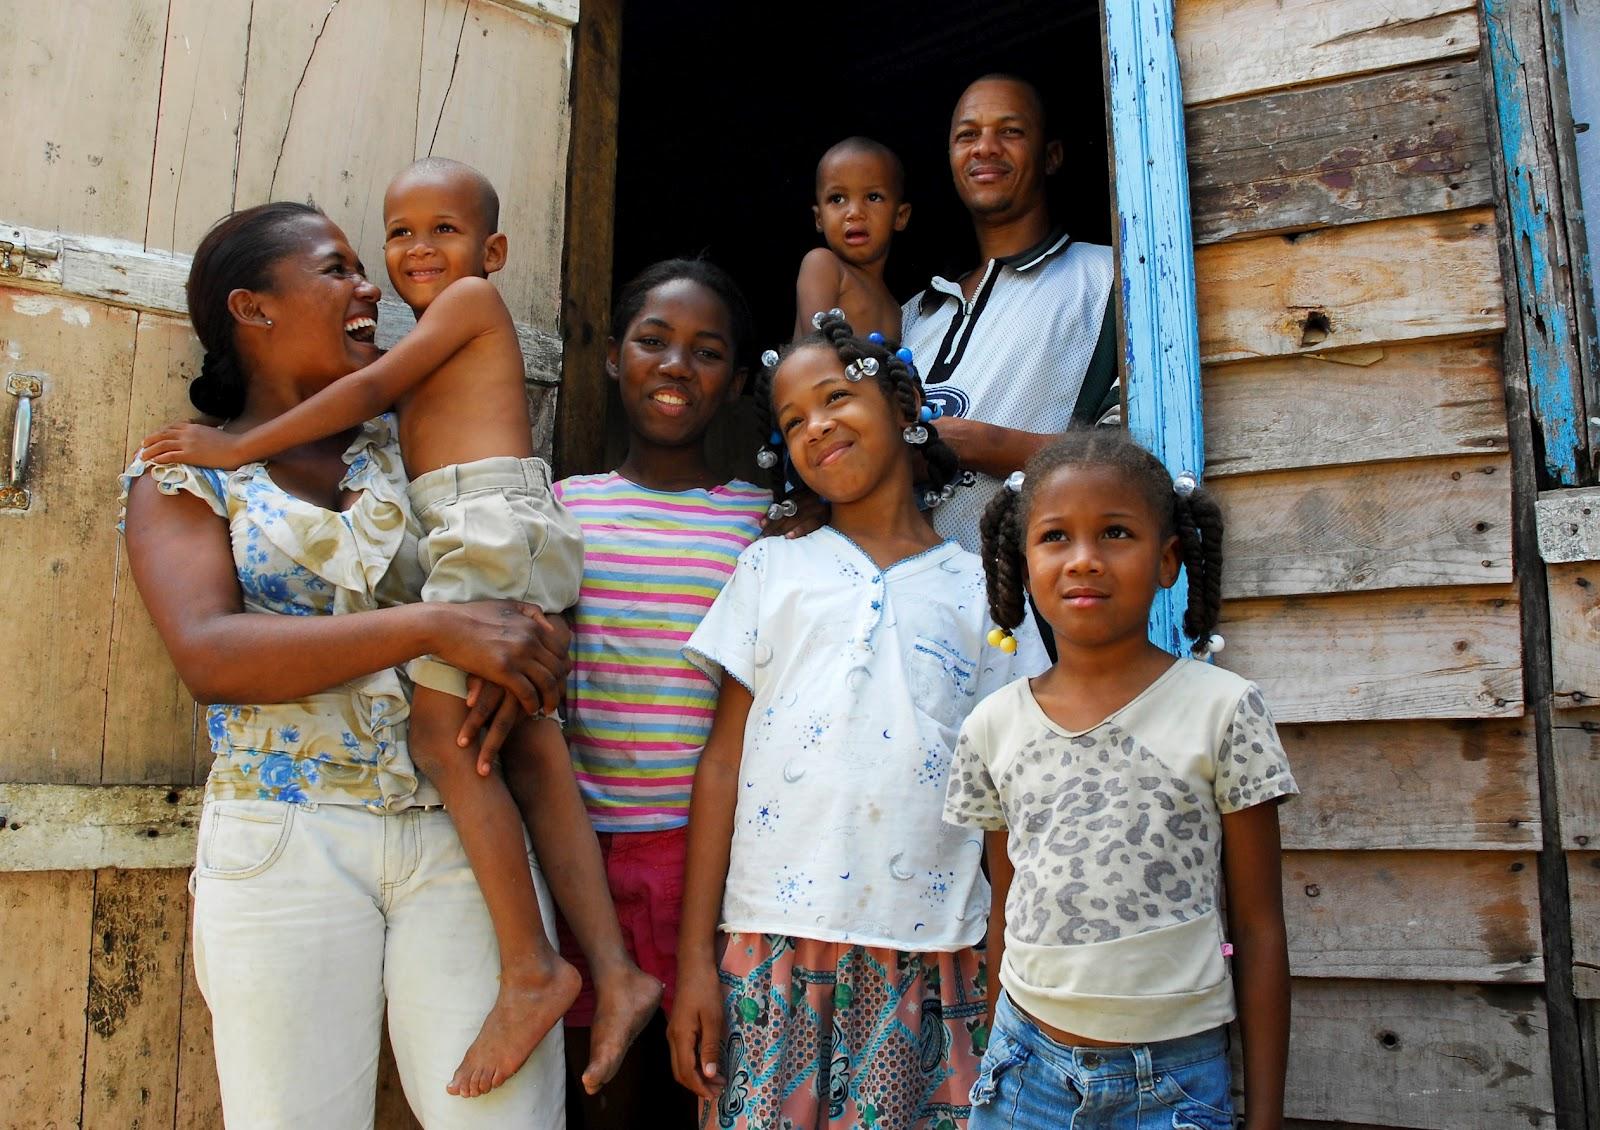 Фото народа Доминиканы